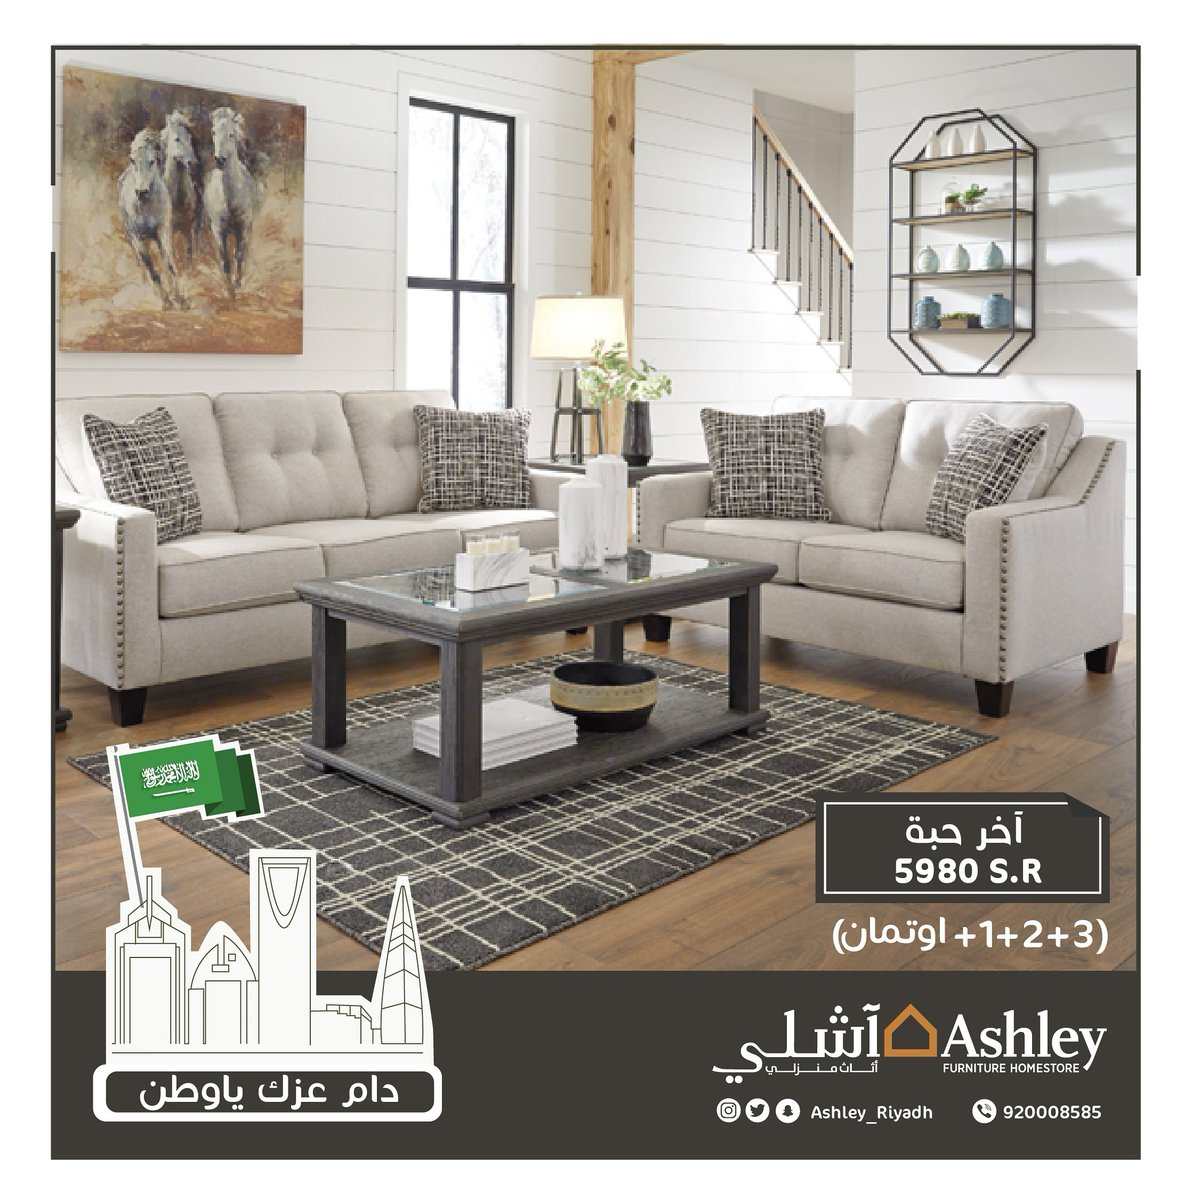 Ashley Furniture اشلي On Twitter عروض اليوم الوطني من آشلي الرياض عروض اليوم الوطني88 سيمبل سيتي اشلي آشلي الرياض